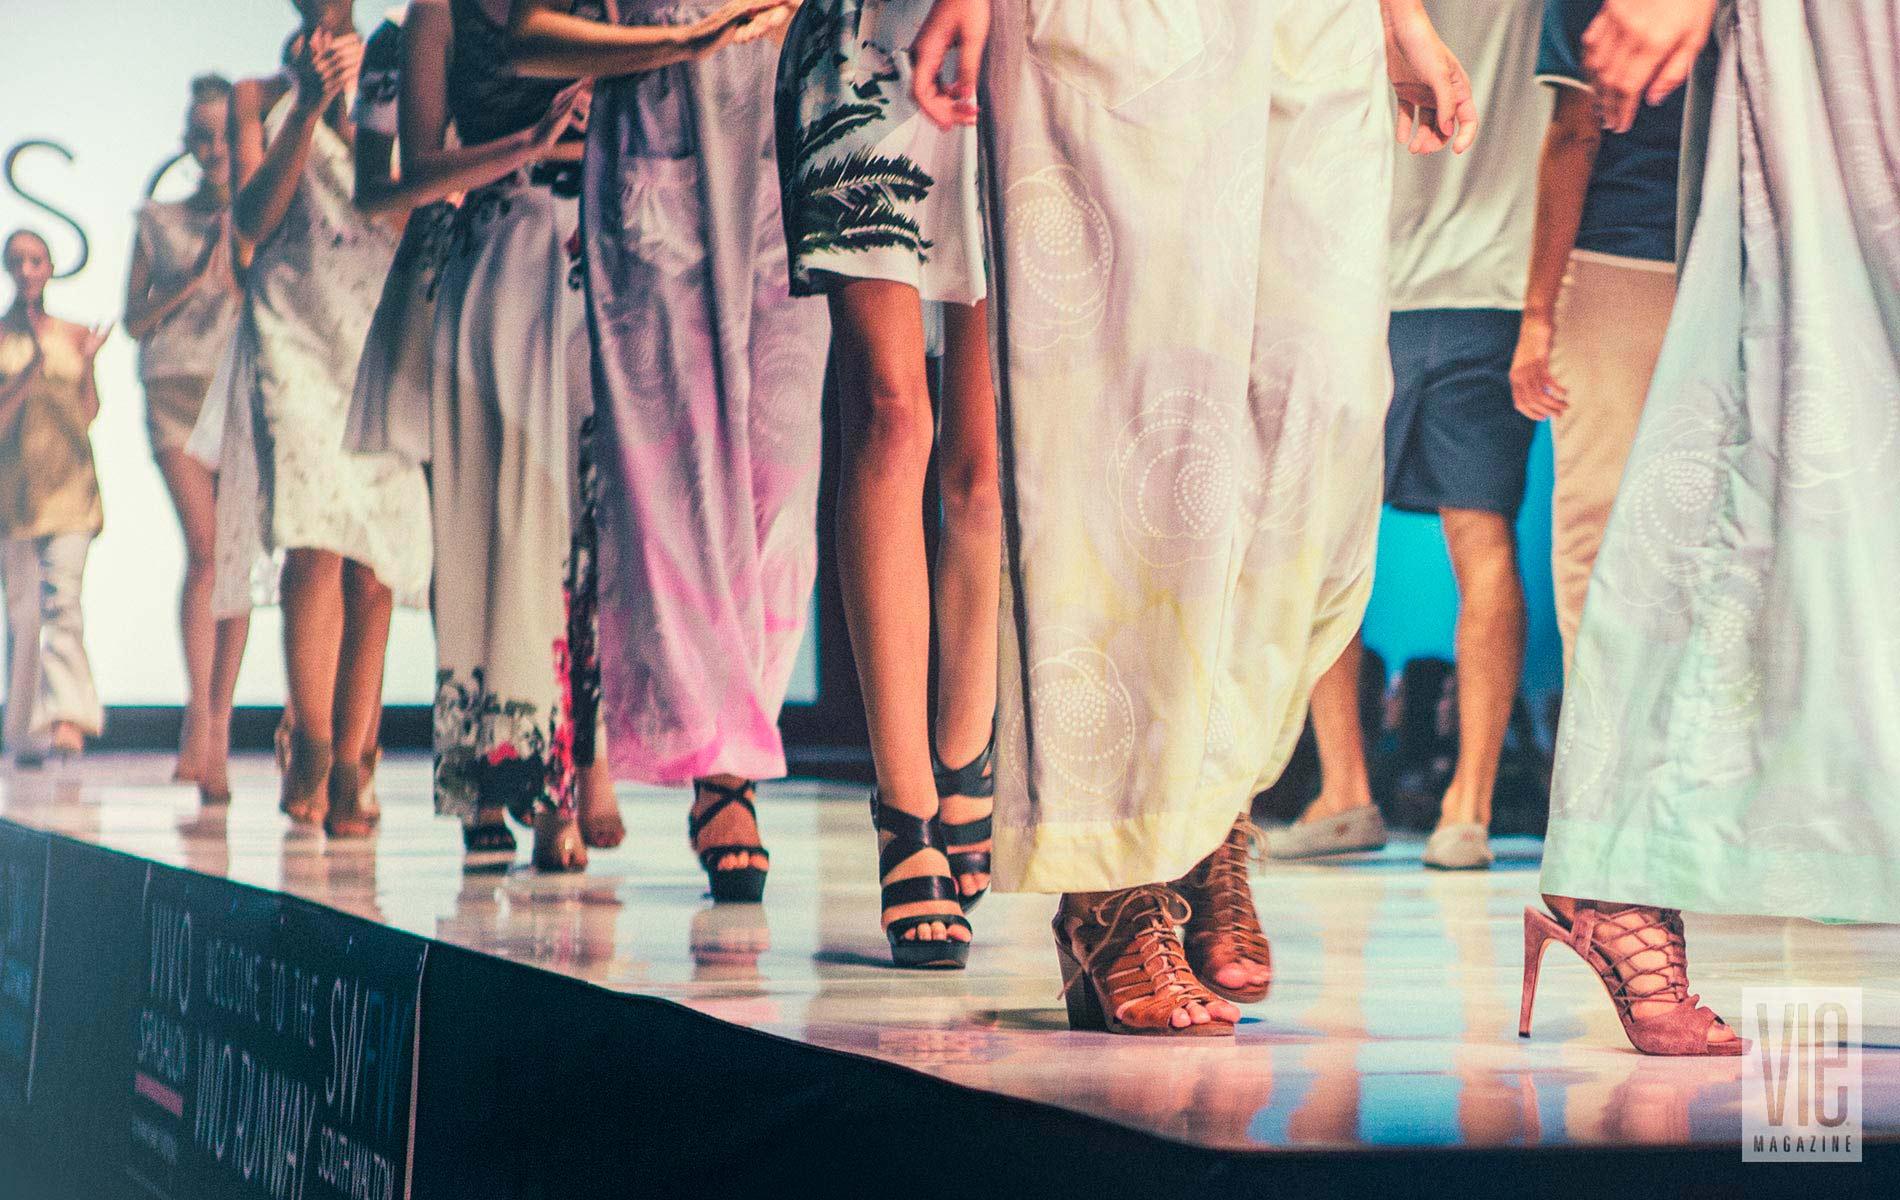 South Walton Fashion Week runway view